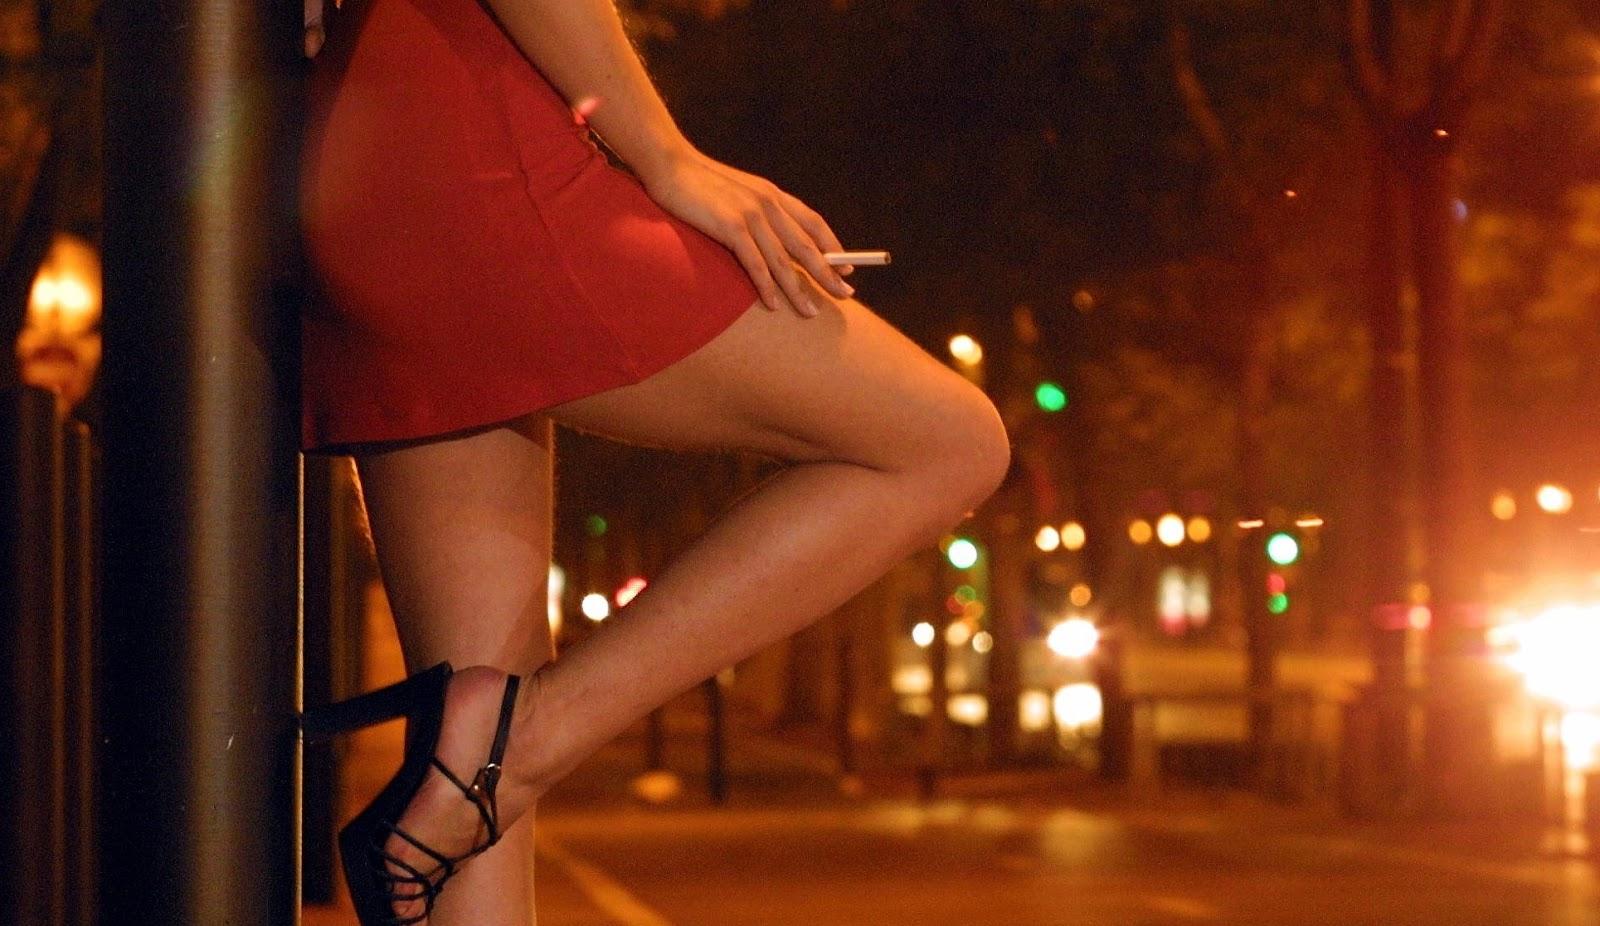 prostitutki-proverennie-foto-novosibirsk